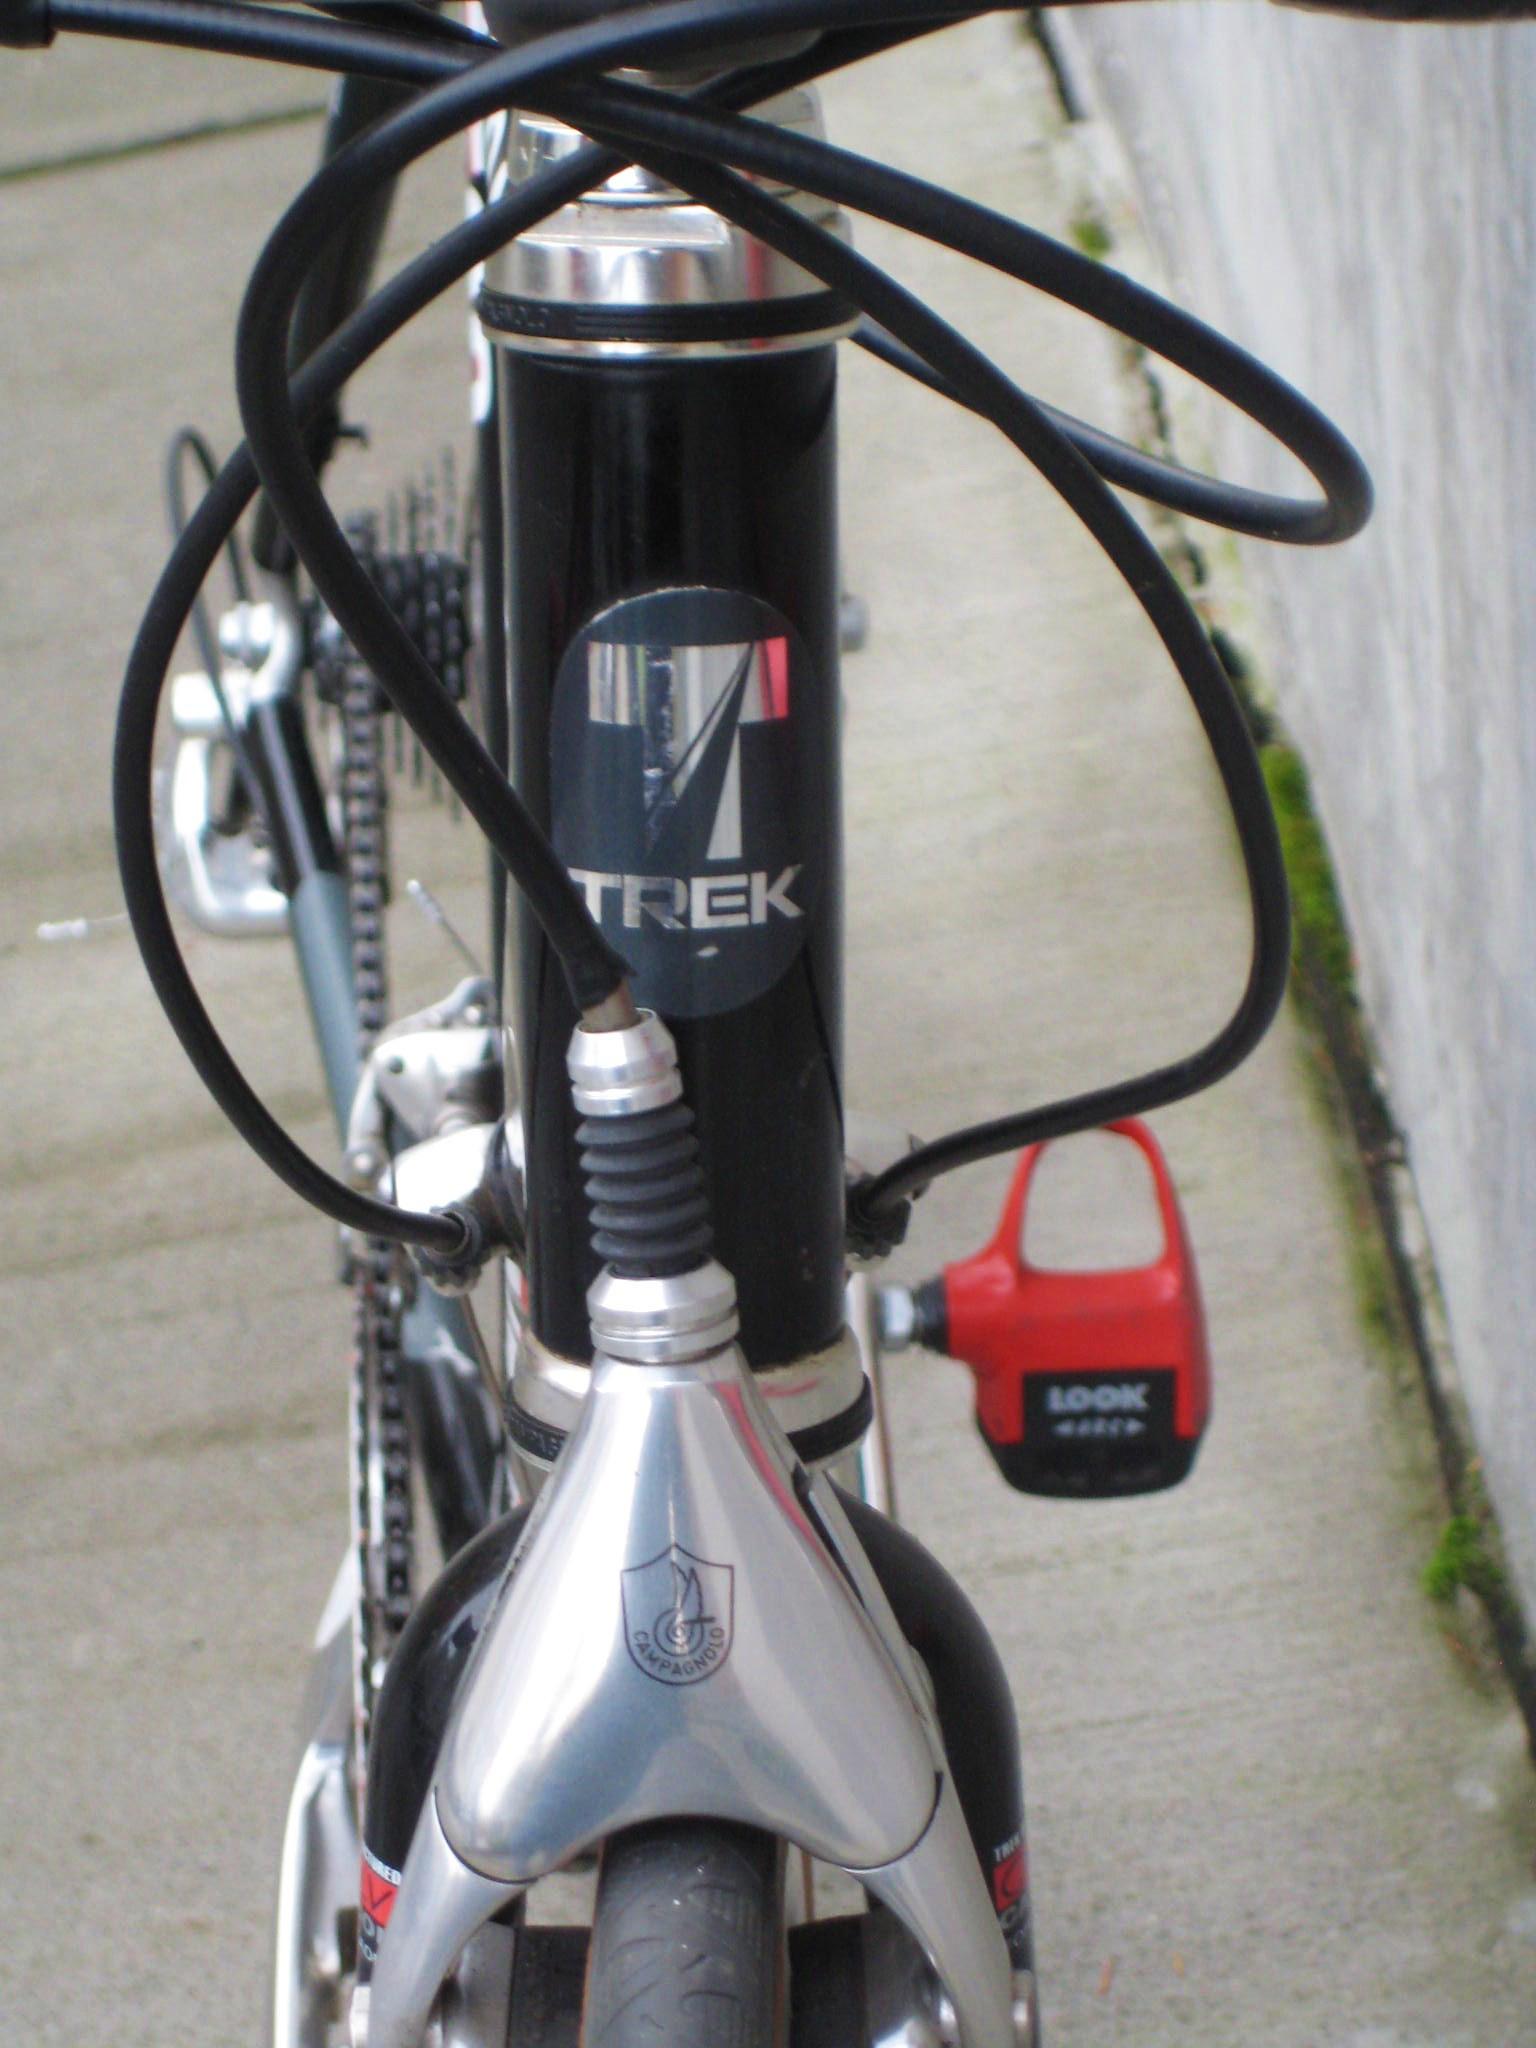 Carbon Fiber Bikes >> 1992 Trek 5500 OCLV Carbon fiber road bike | Classic Cycle Bainbridge Island Kitsap County